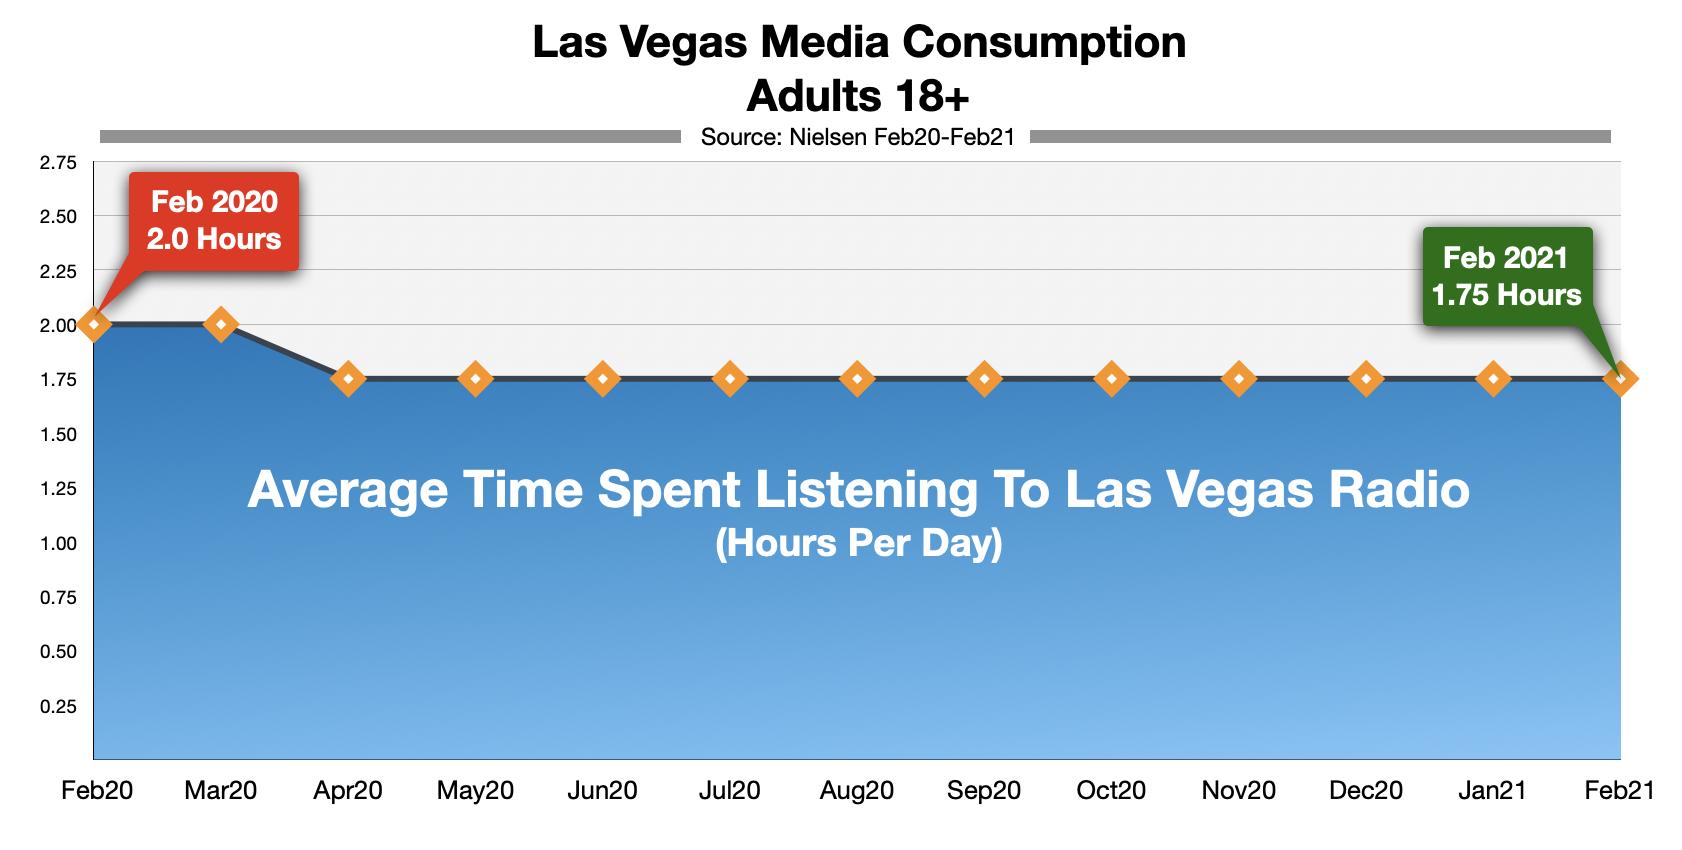 Advertising On Las Vegas Radio: Time-Spent-Listening